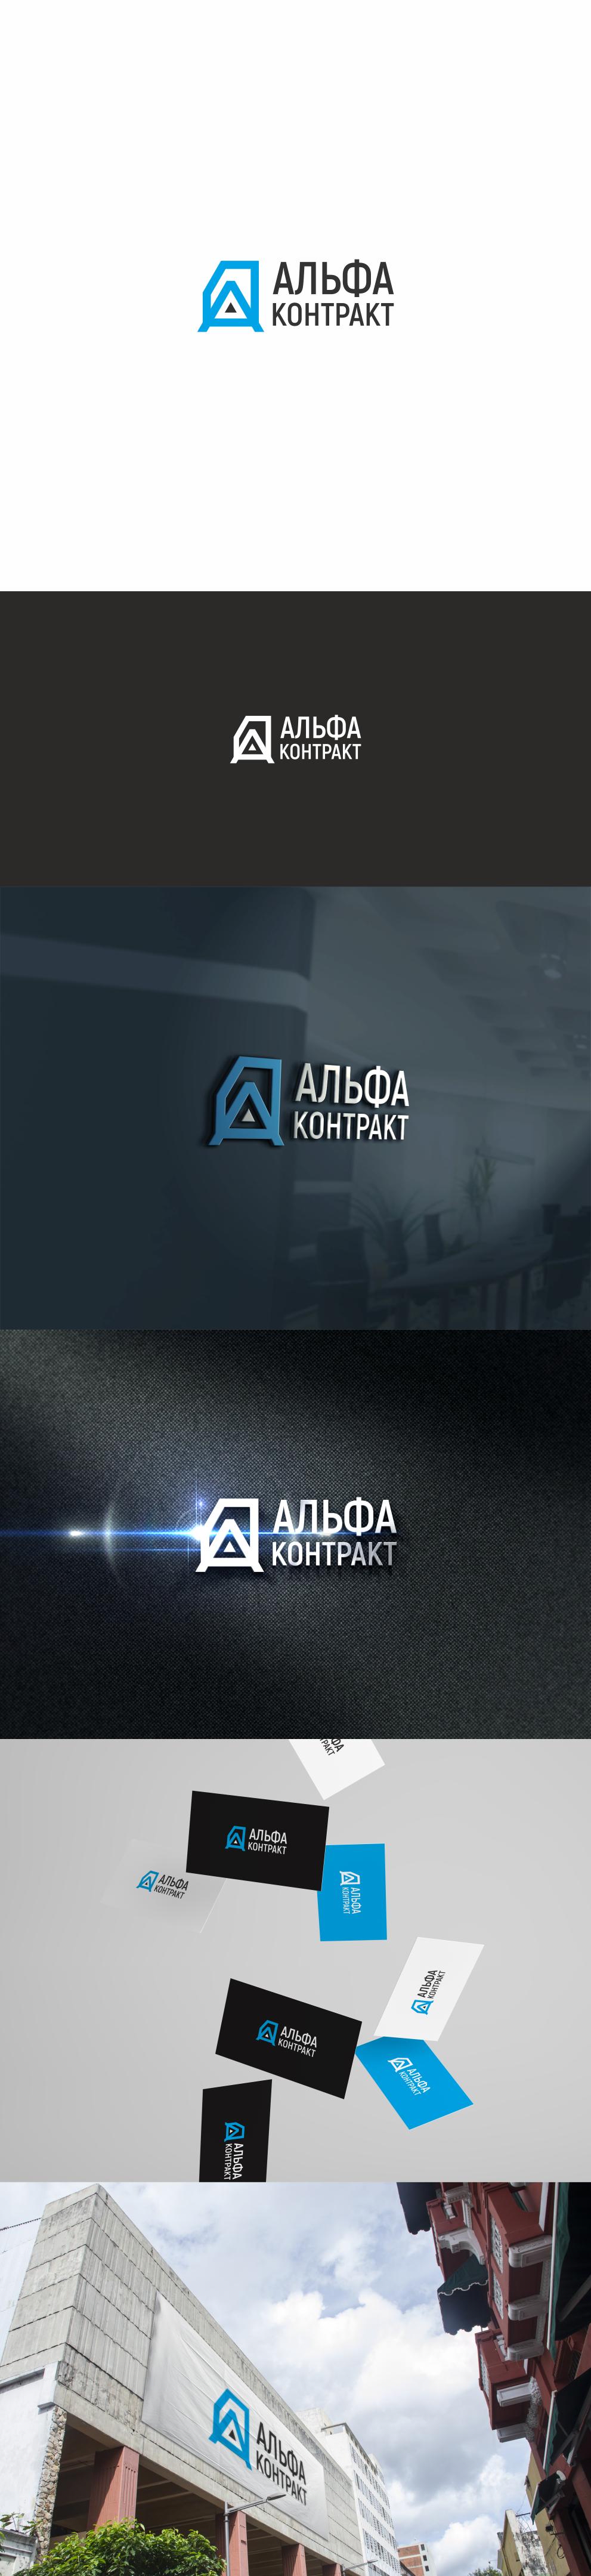 Дизайнер для разработки логотипа компании фото f_1935bfbeafb0690e.jpg